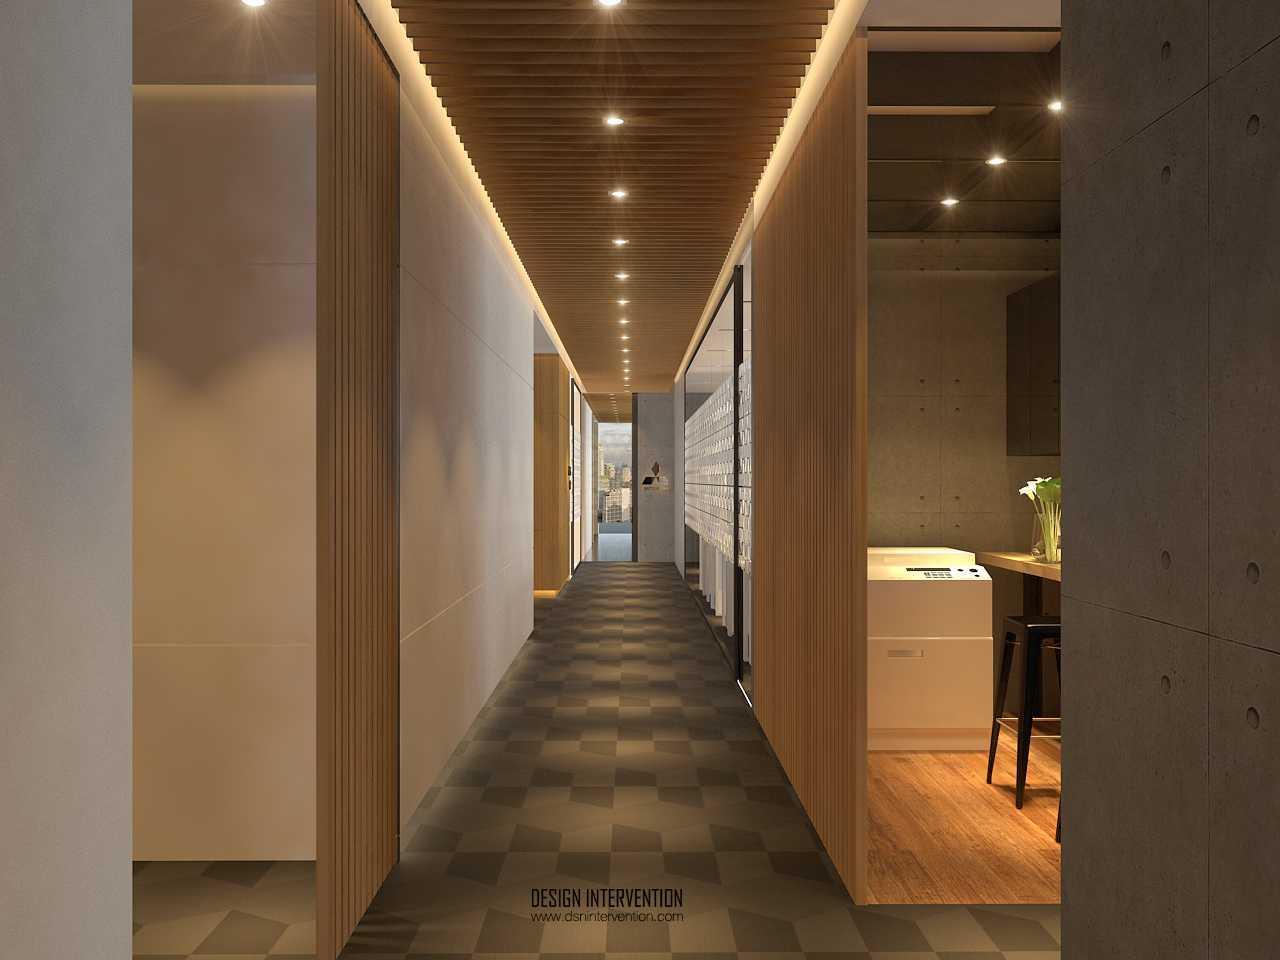 Design Intervention Mitsubishi Hq Office Tebet Tebet Corridor   14978